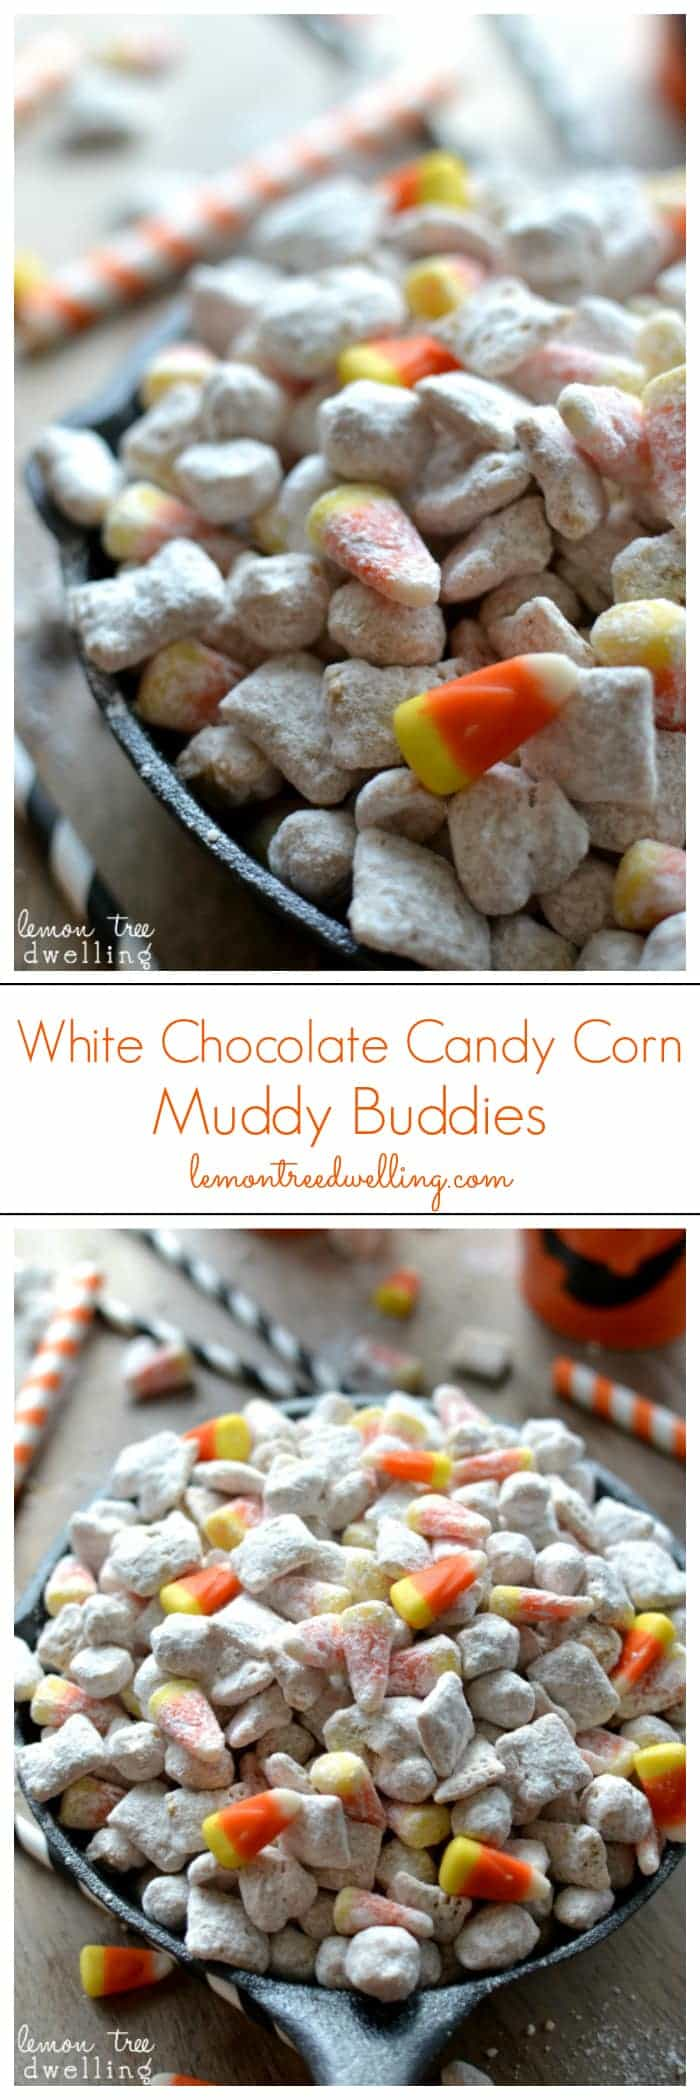 Sweet & Salty White Chocolate Candy Corn Muddy Buddies!